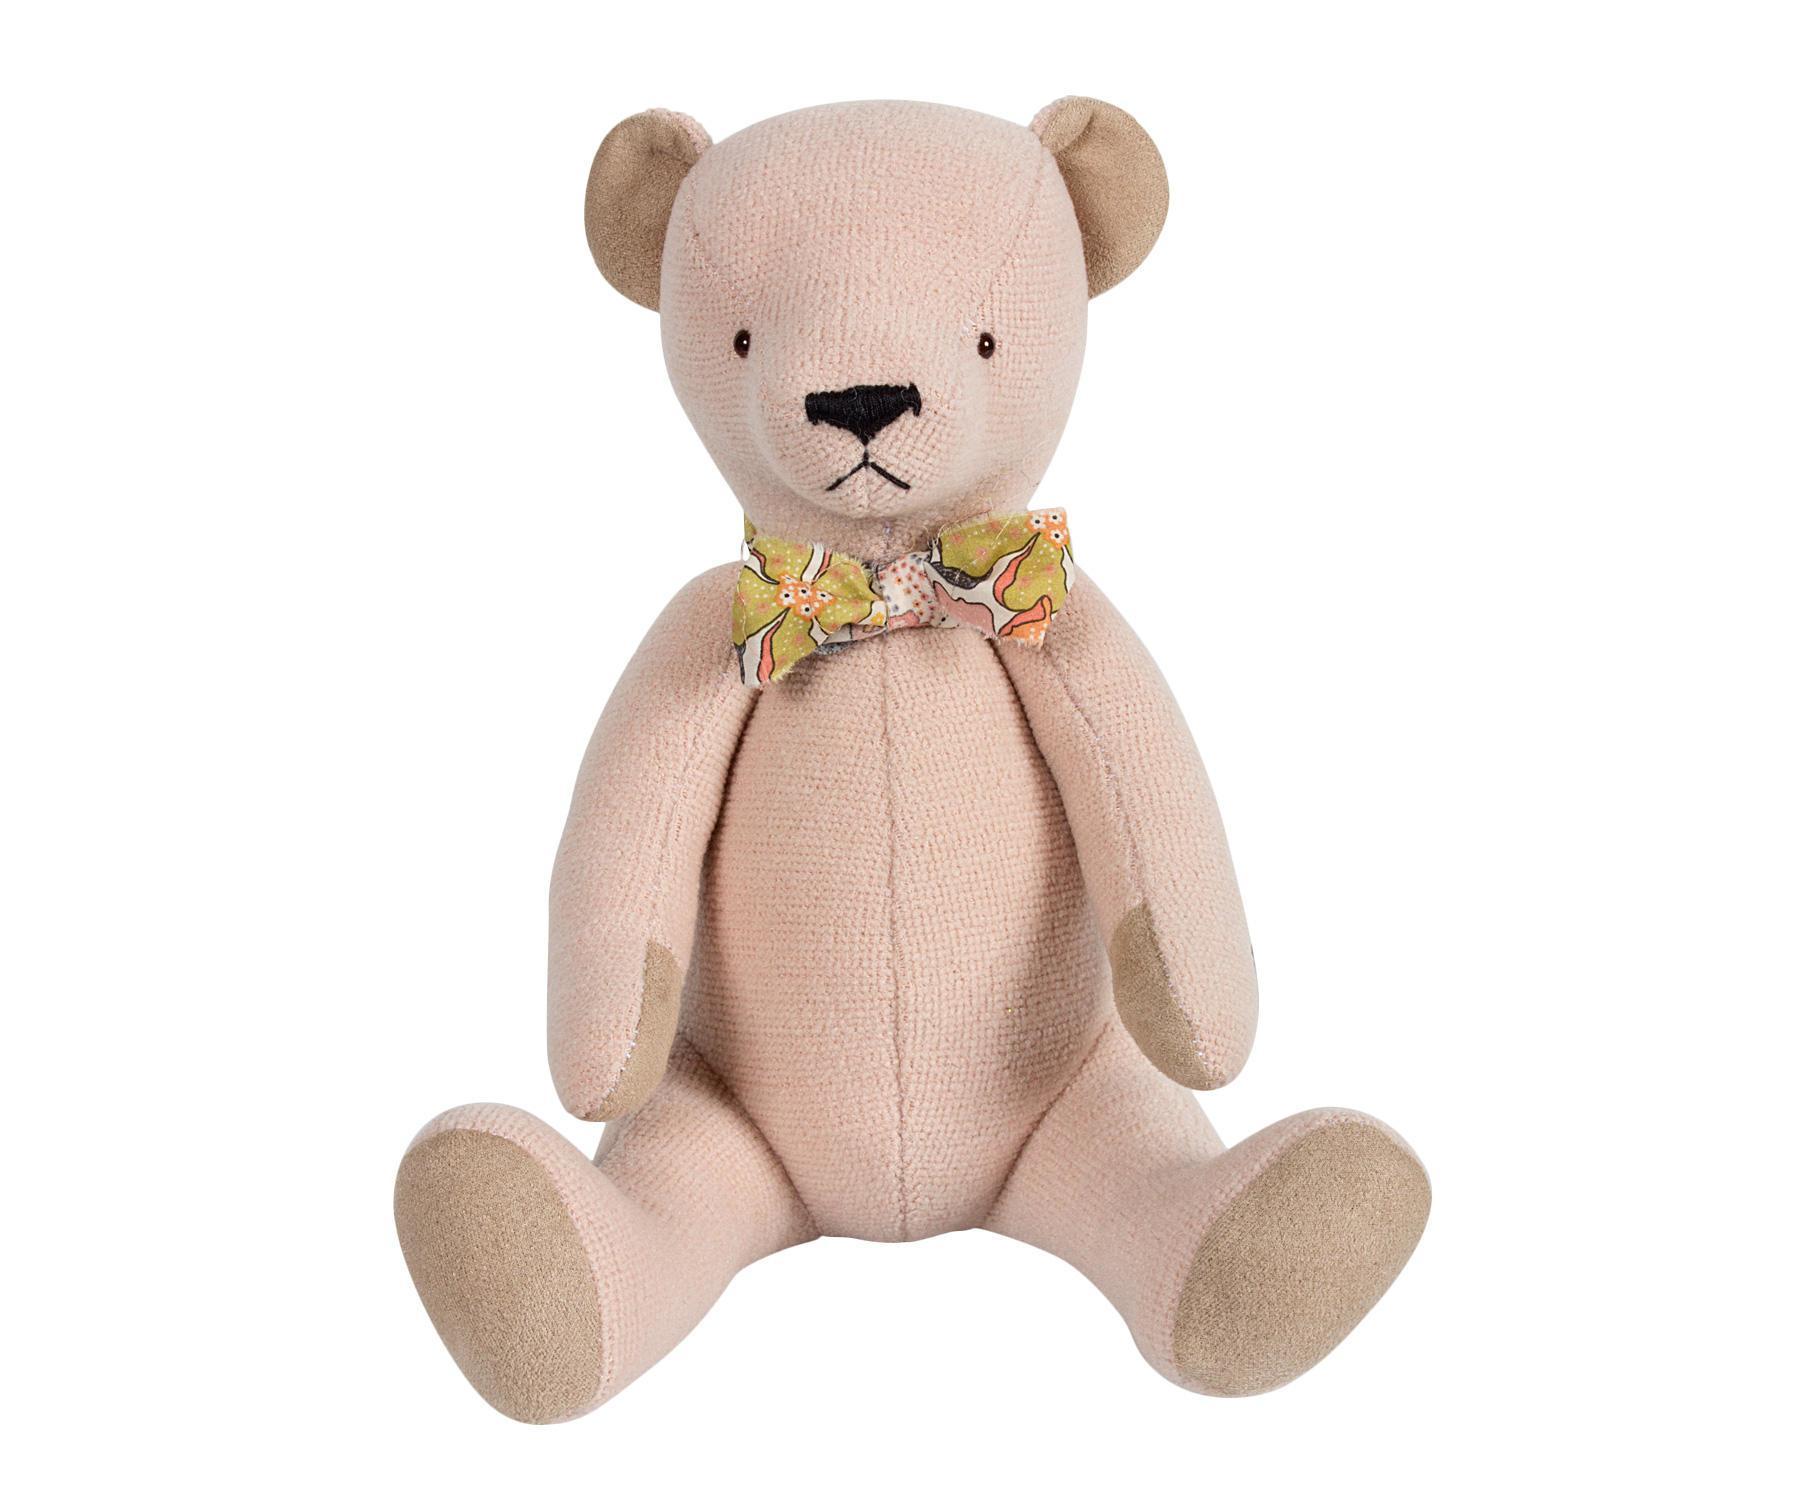 Maileg Medvídek Teddy Bear v taštičce - růžový, růžová barva, textil